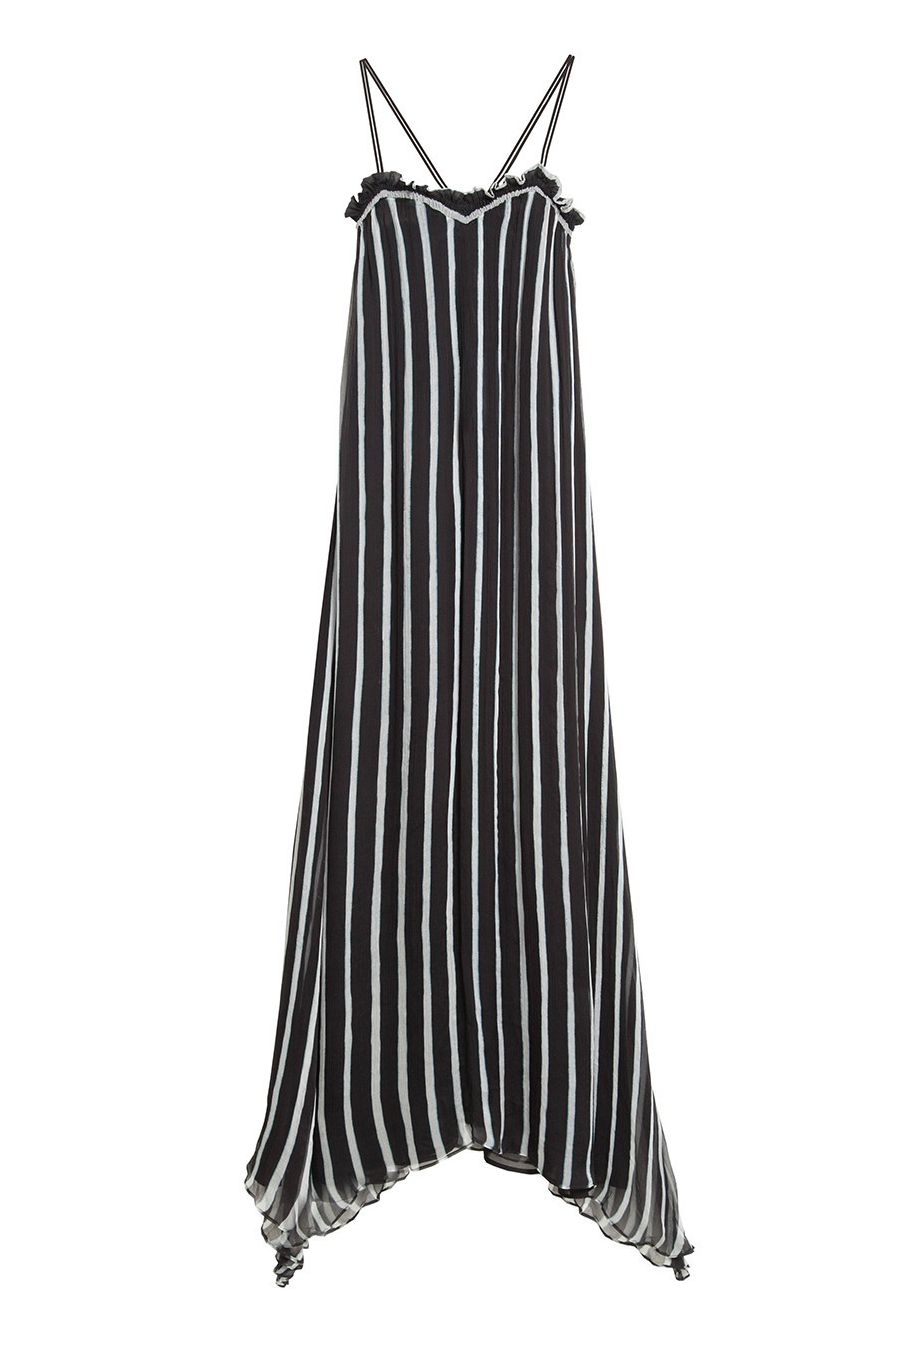 A striped chiffon gown